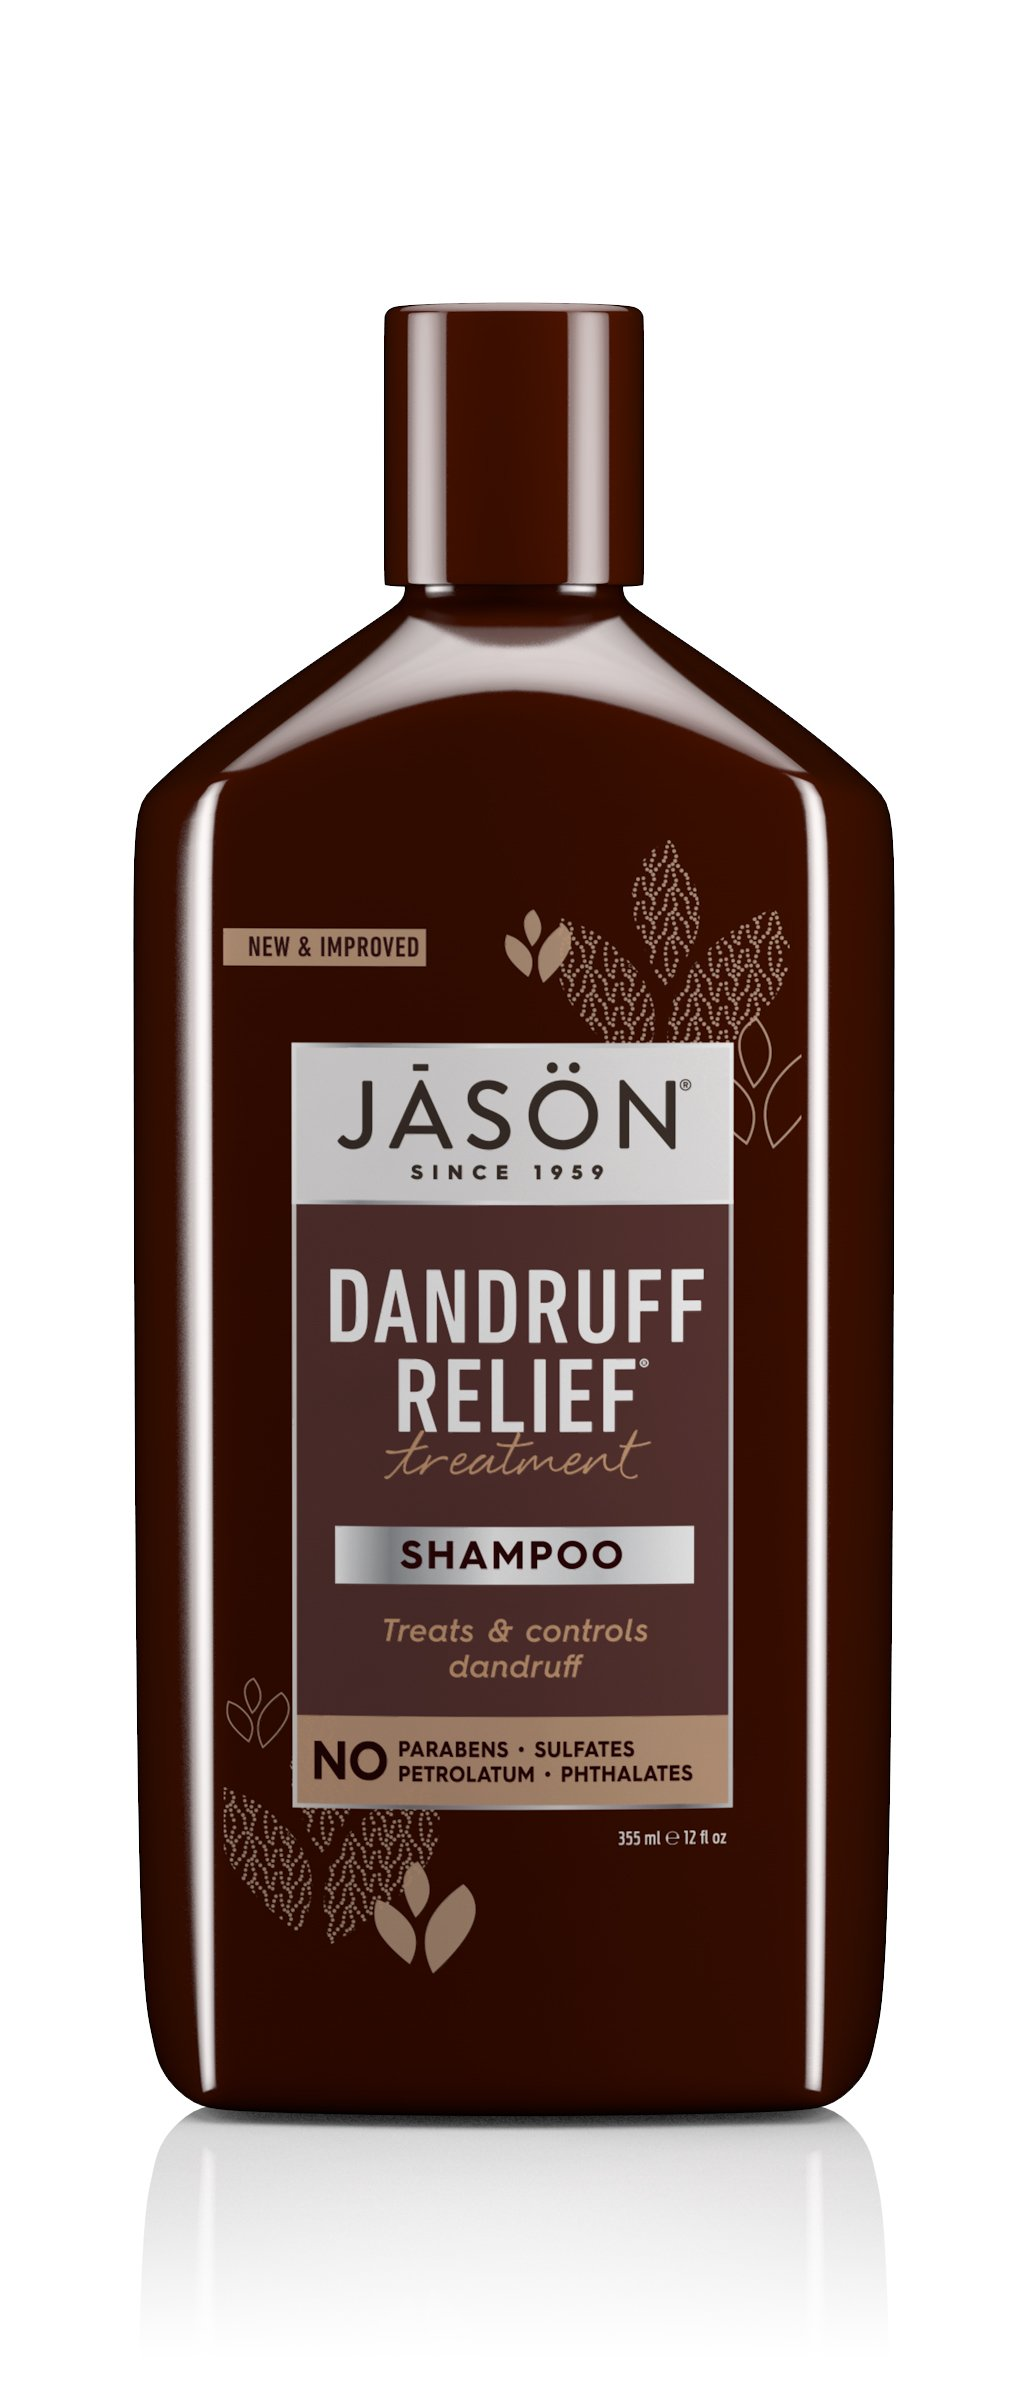 JASON Dandruff Relief Treatment Shampoo, 12 oz. (Packaging May Vary)